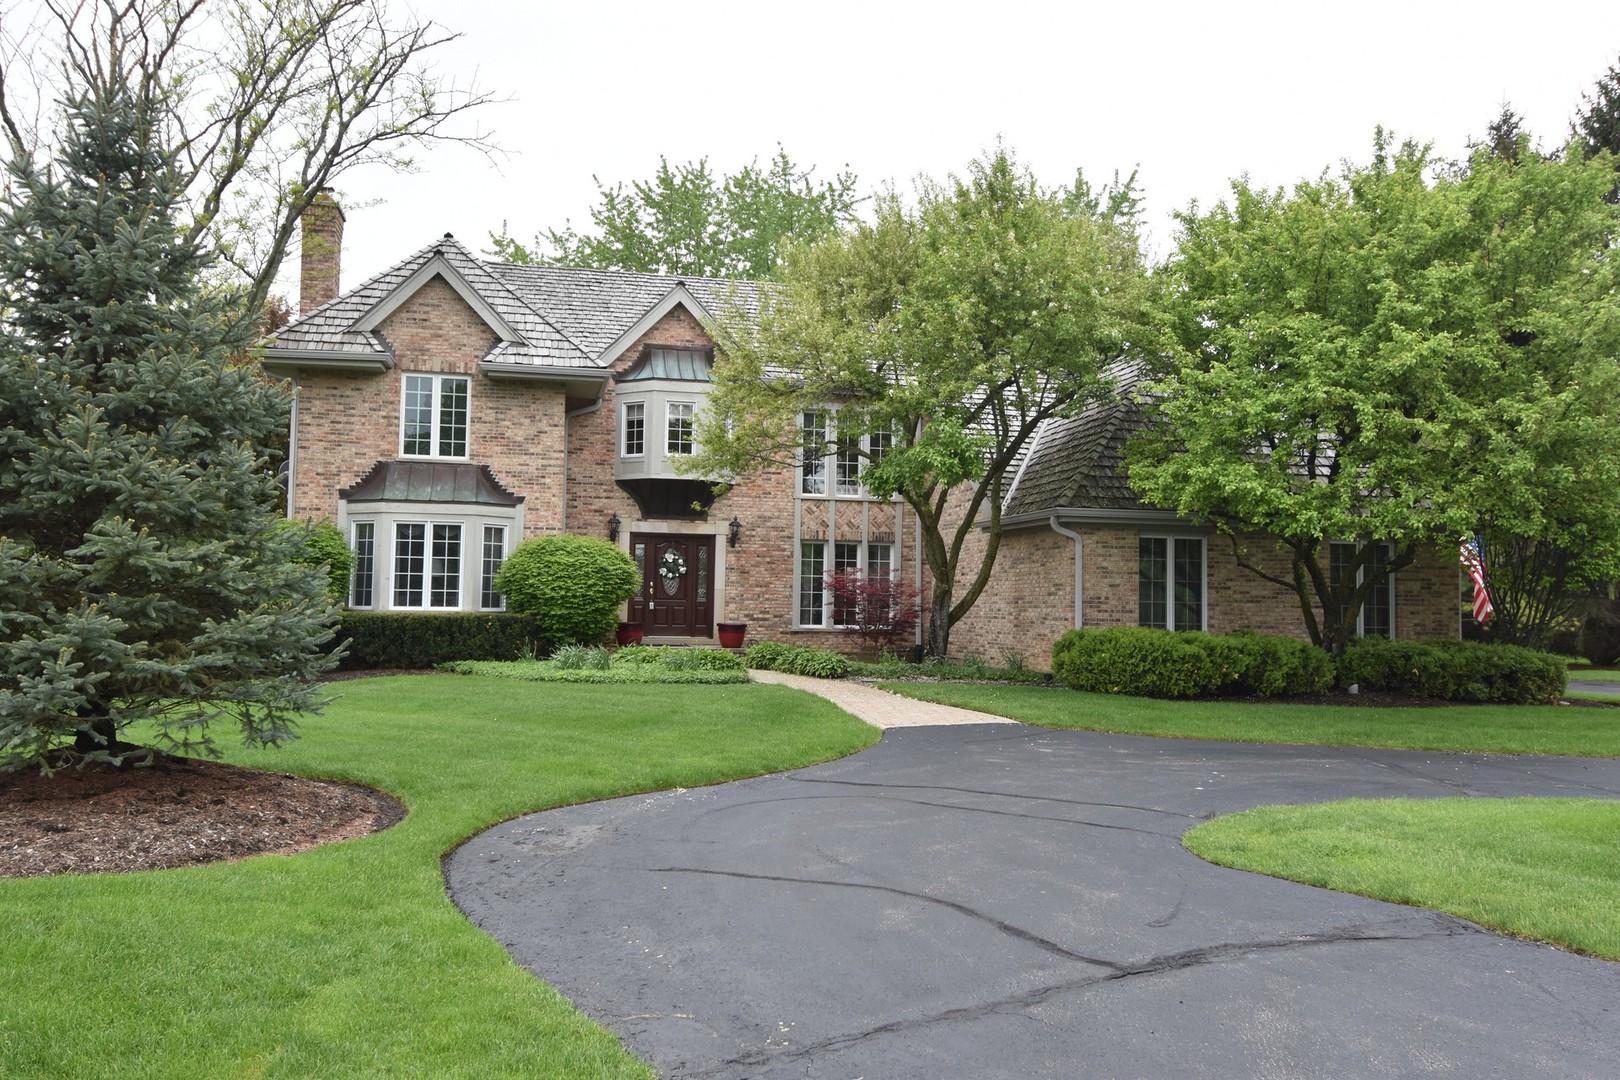 6603 Cobblestone Lane, Long Grove, Illinois 60047